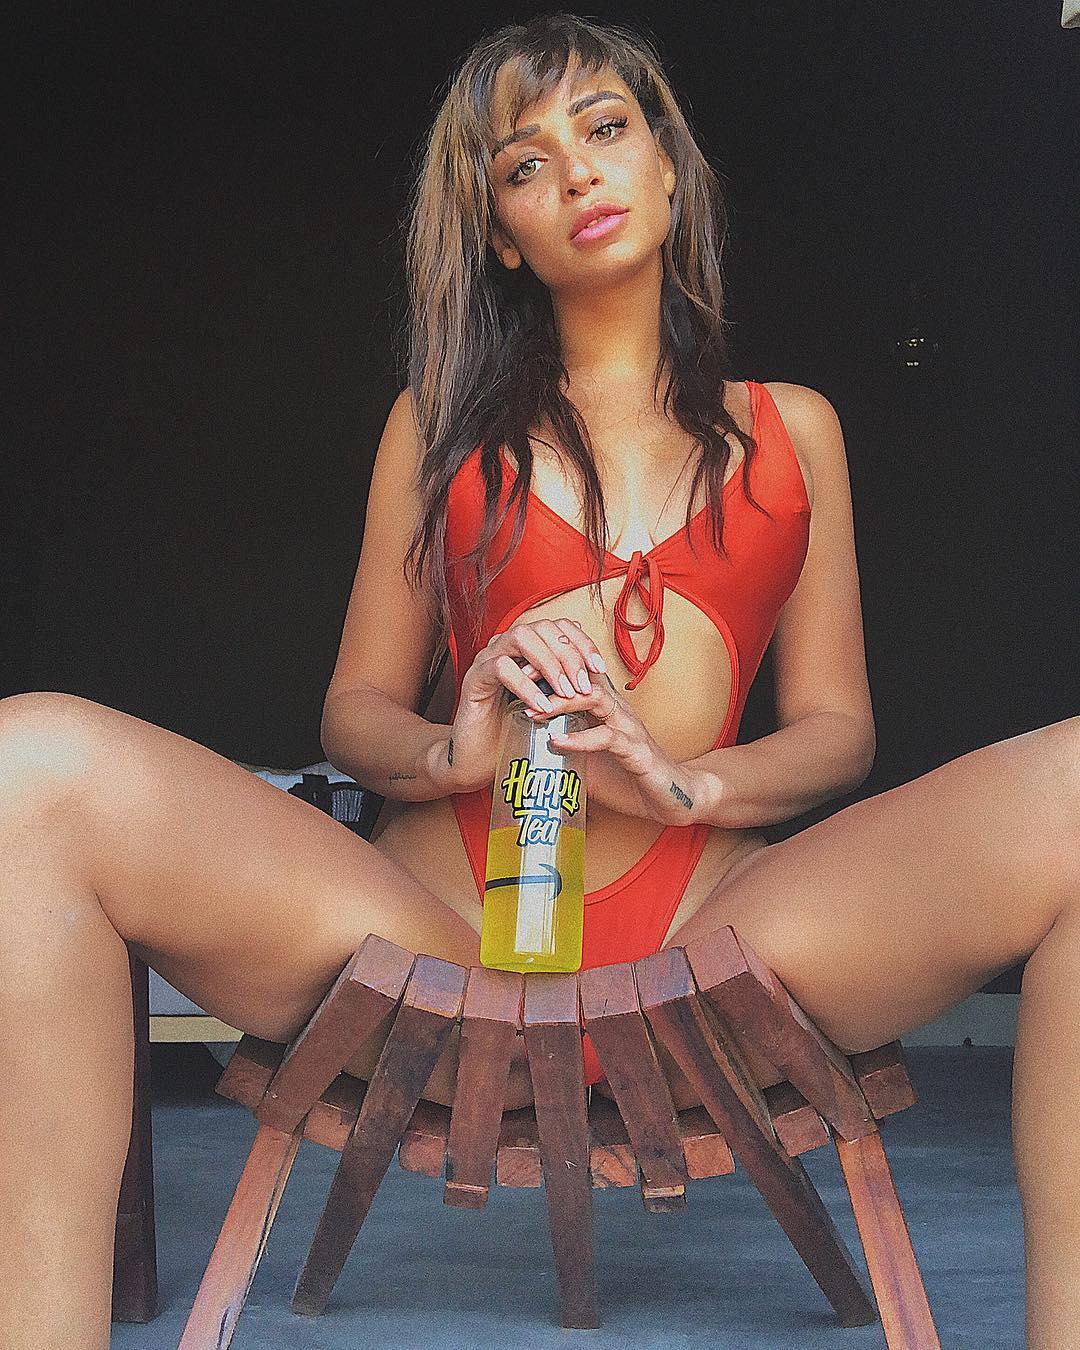 Tori Green Nude Photos Leaked!0062